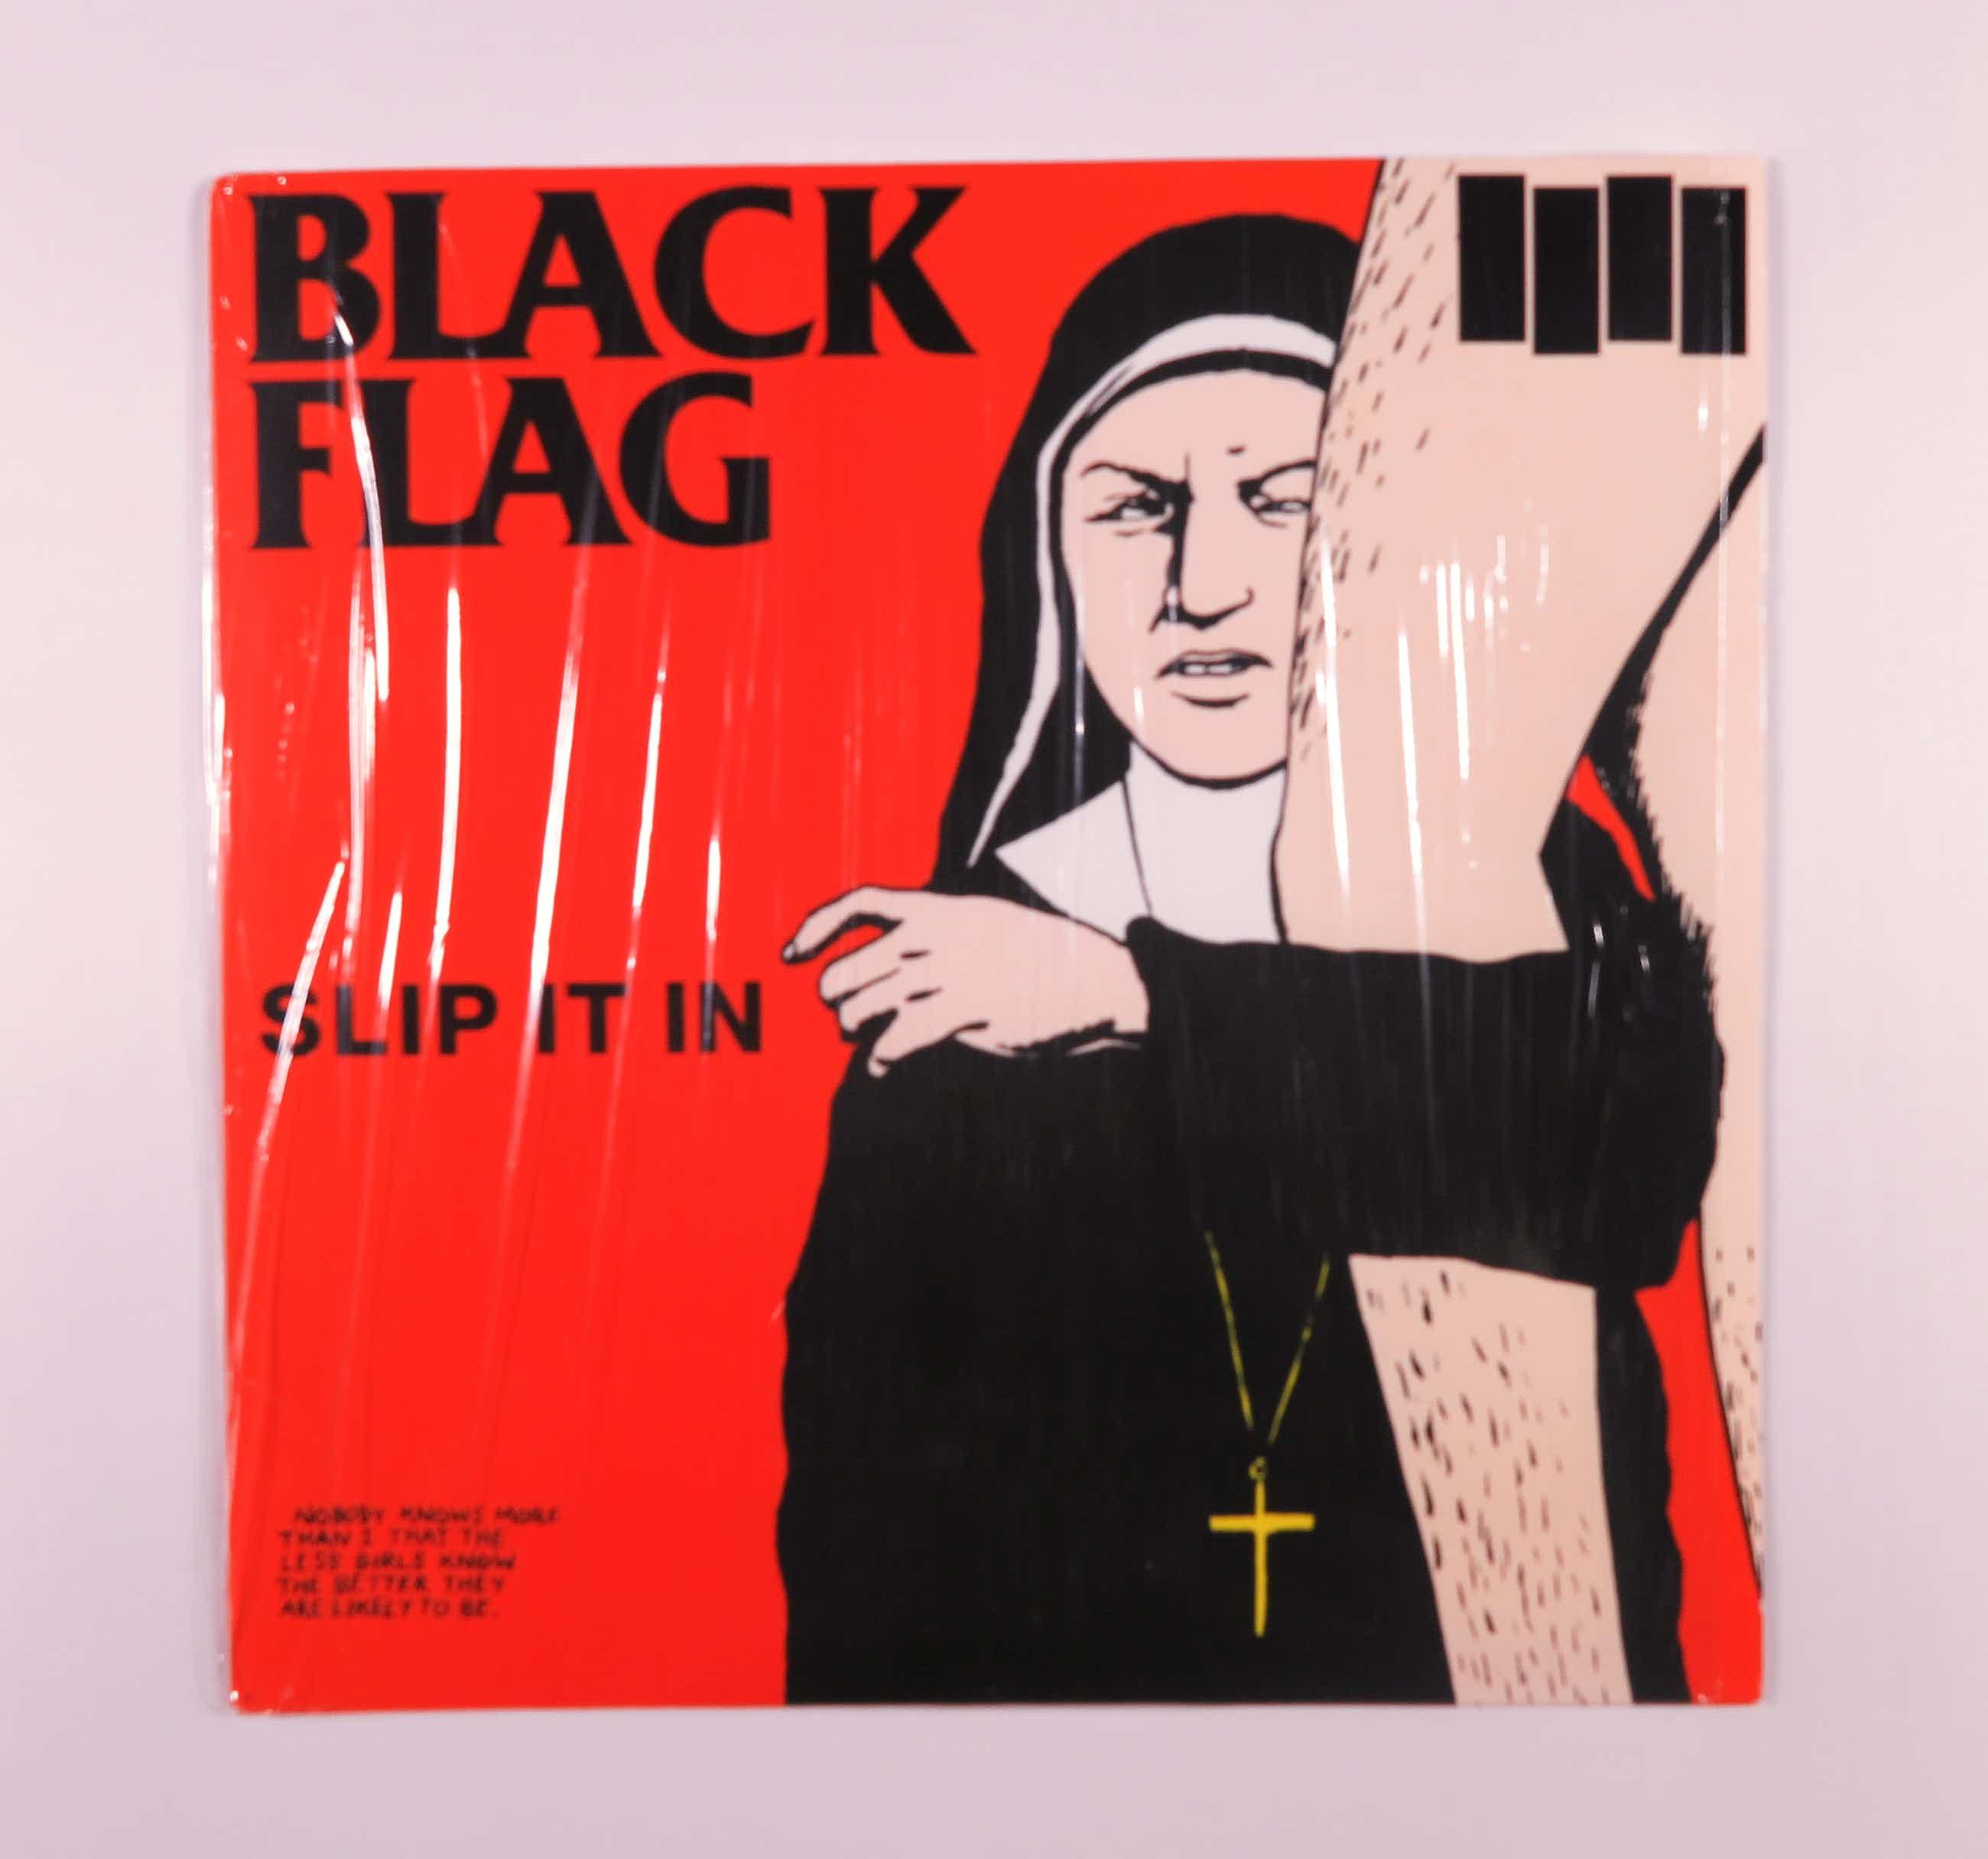 Black Flag - Slip it in - Hoesontwerp Raymond Pettibon kopen? Bied vanaf 20!